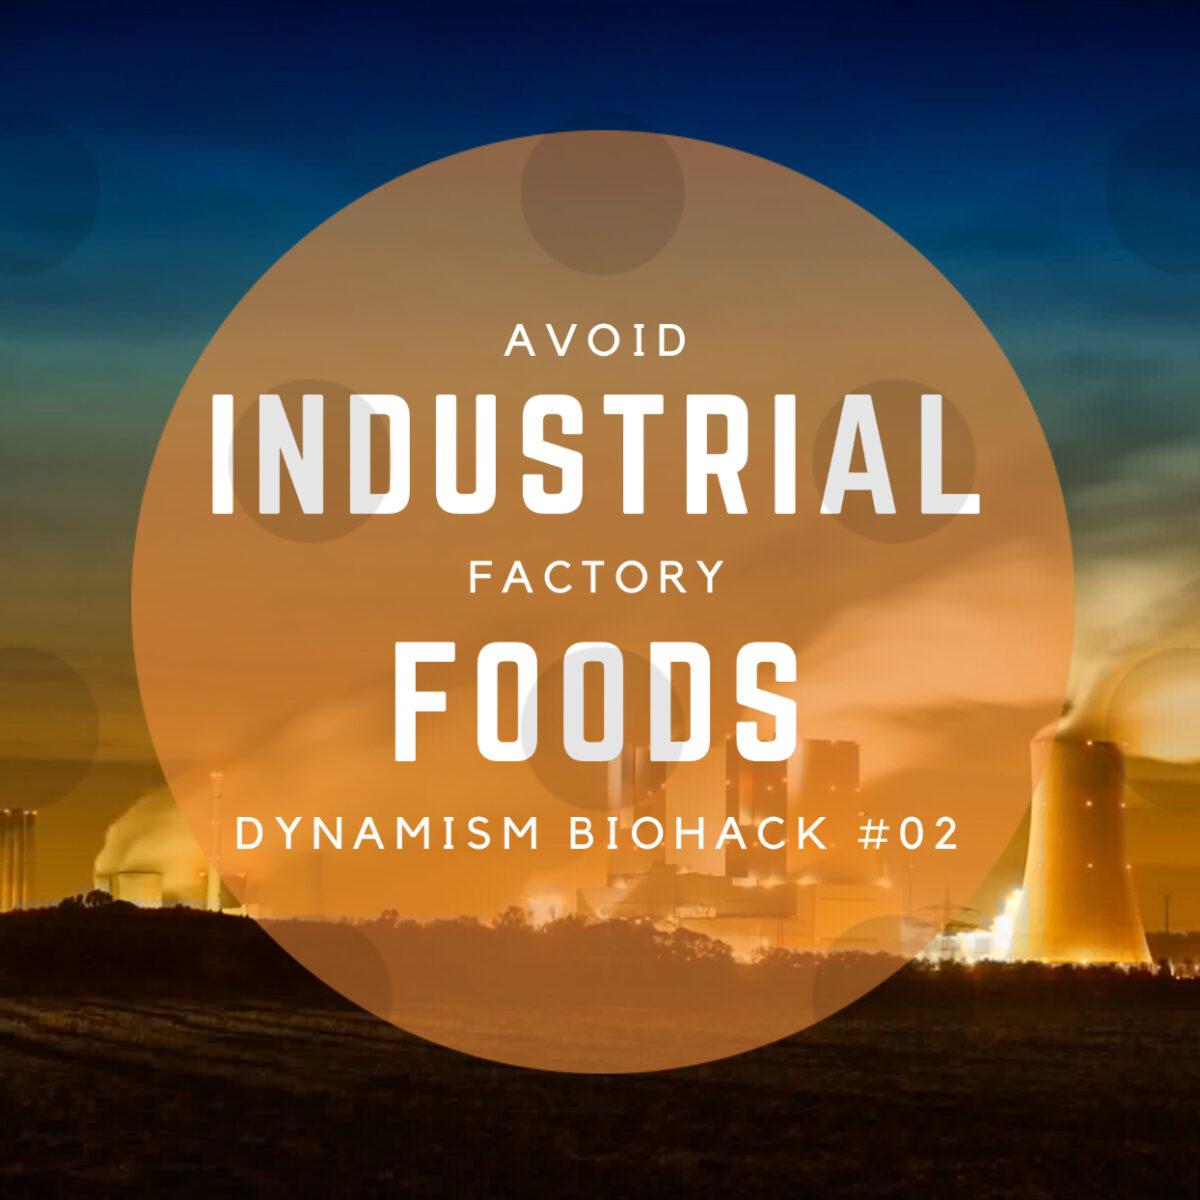 #2: Avoid Industrial Factory Foods